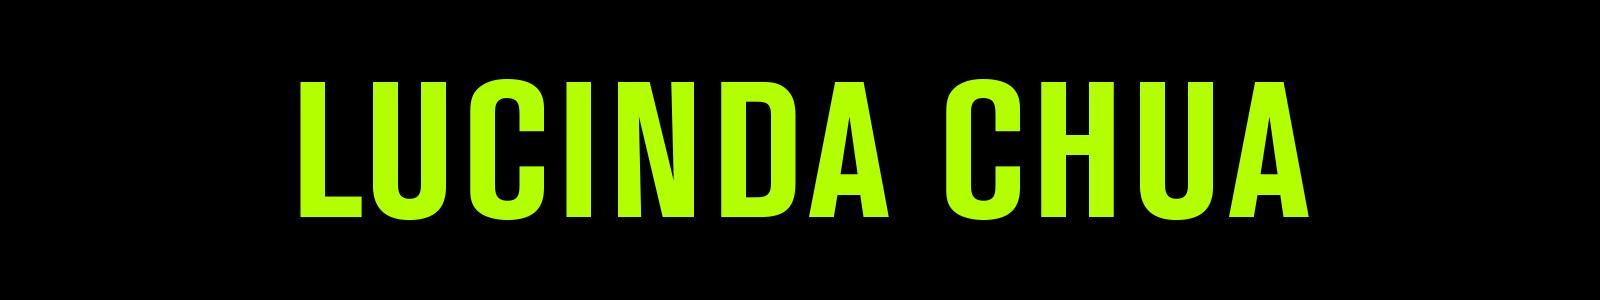 Lucinda Chua.png